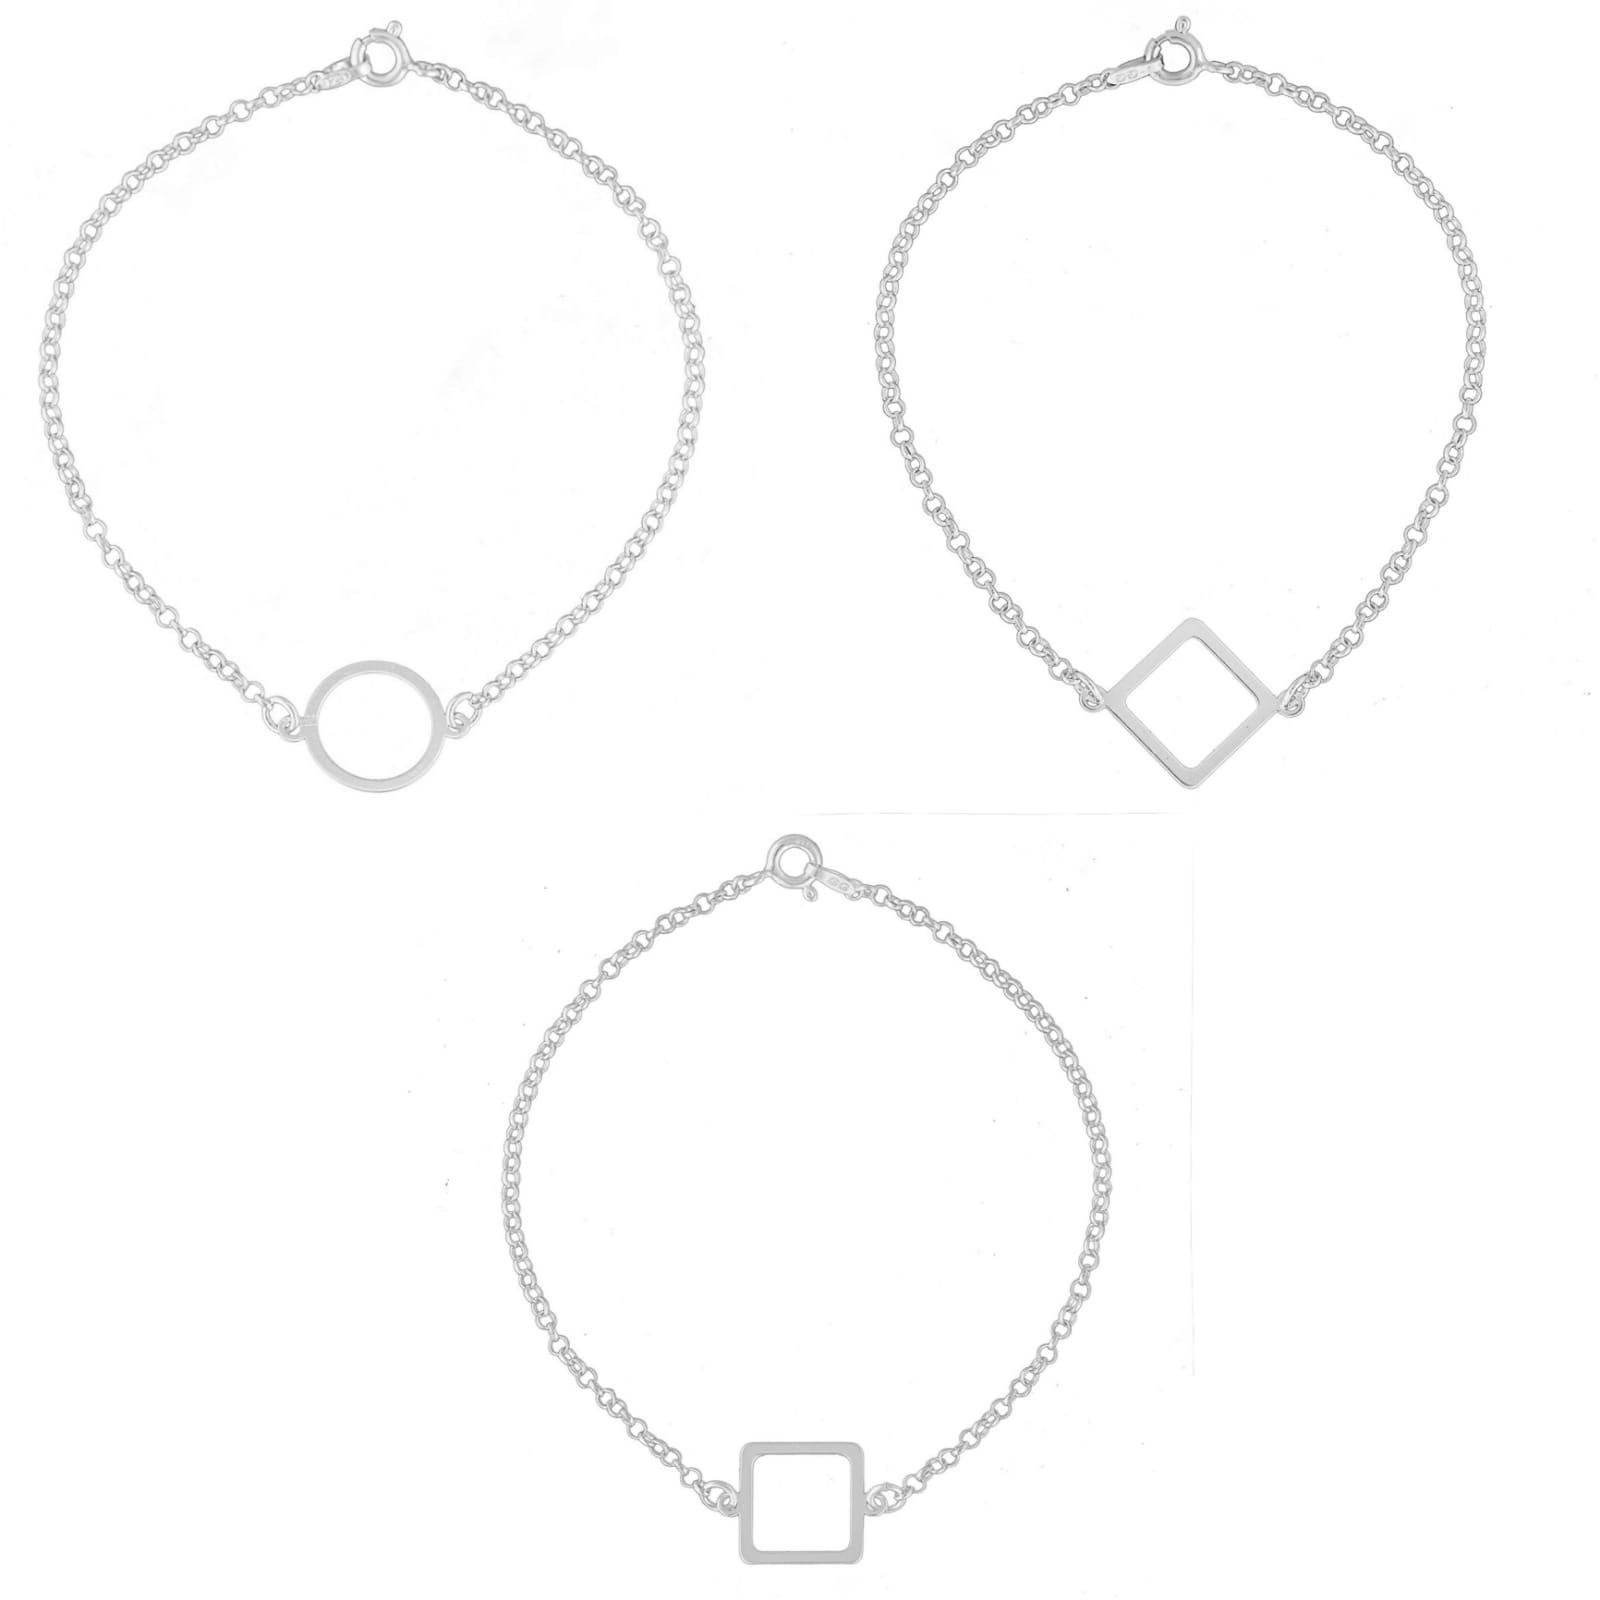 Kit Pulseiras Geométricas Feminina 18cm De Prata 925